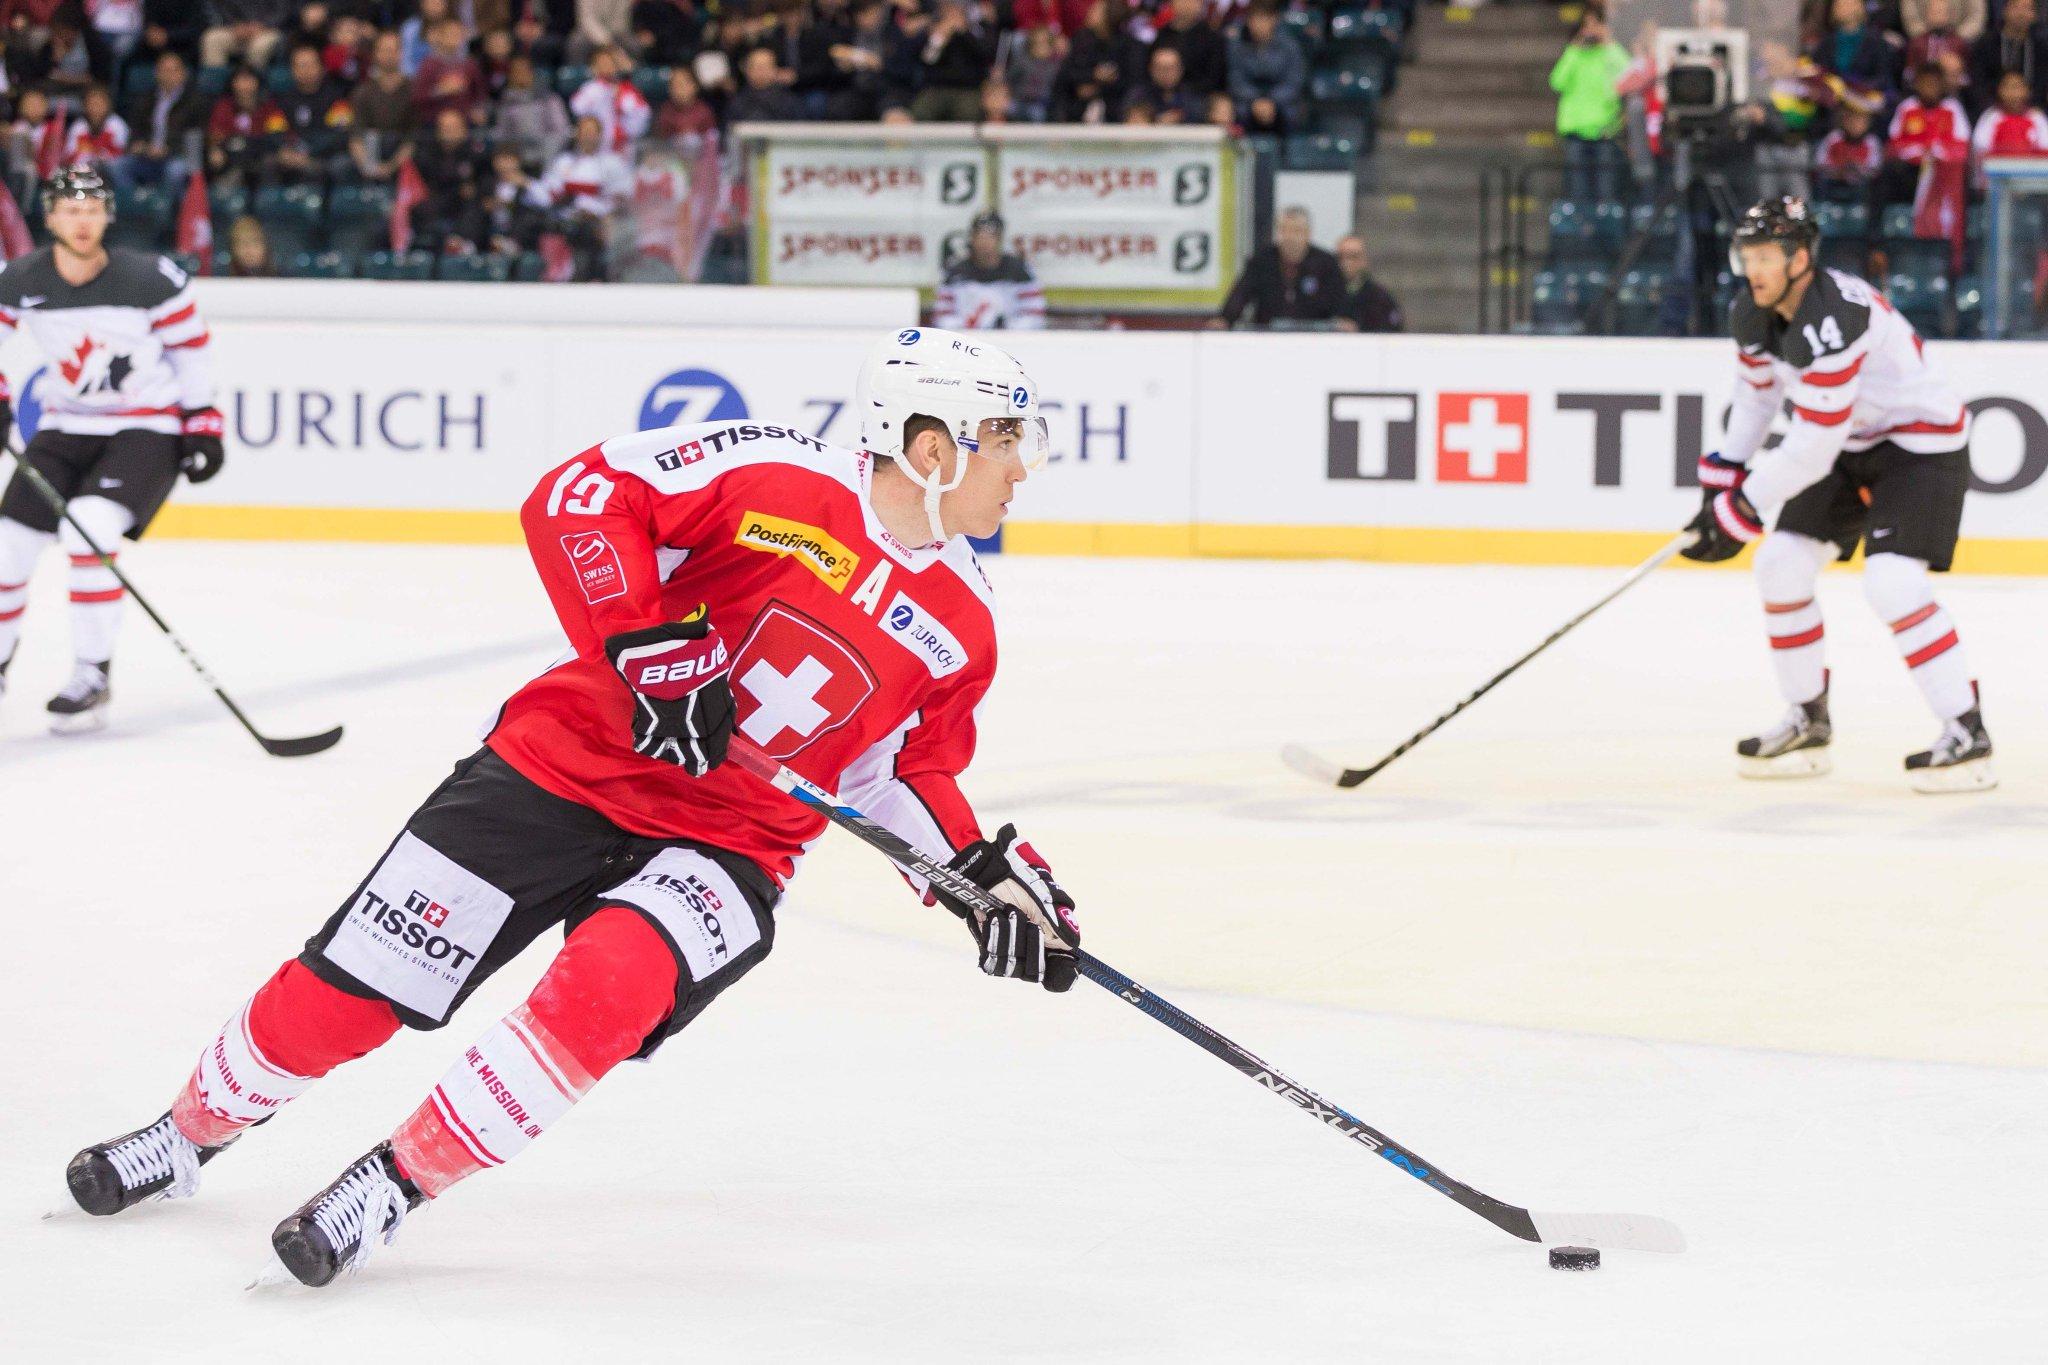 Swiss Ice Hockey